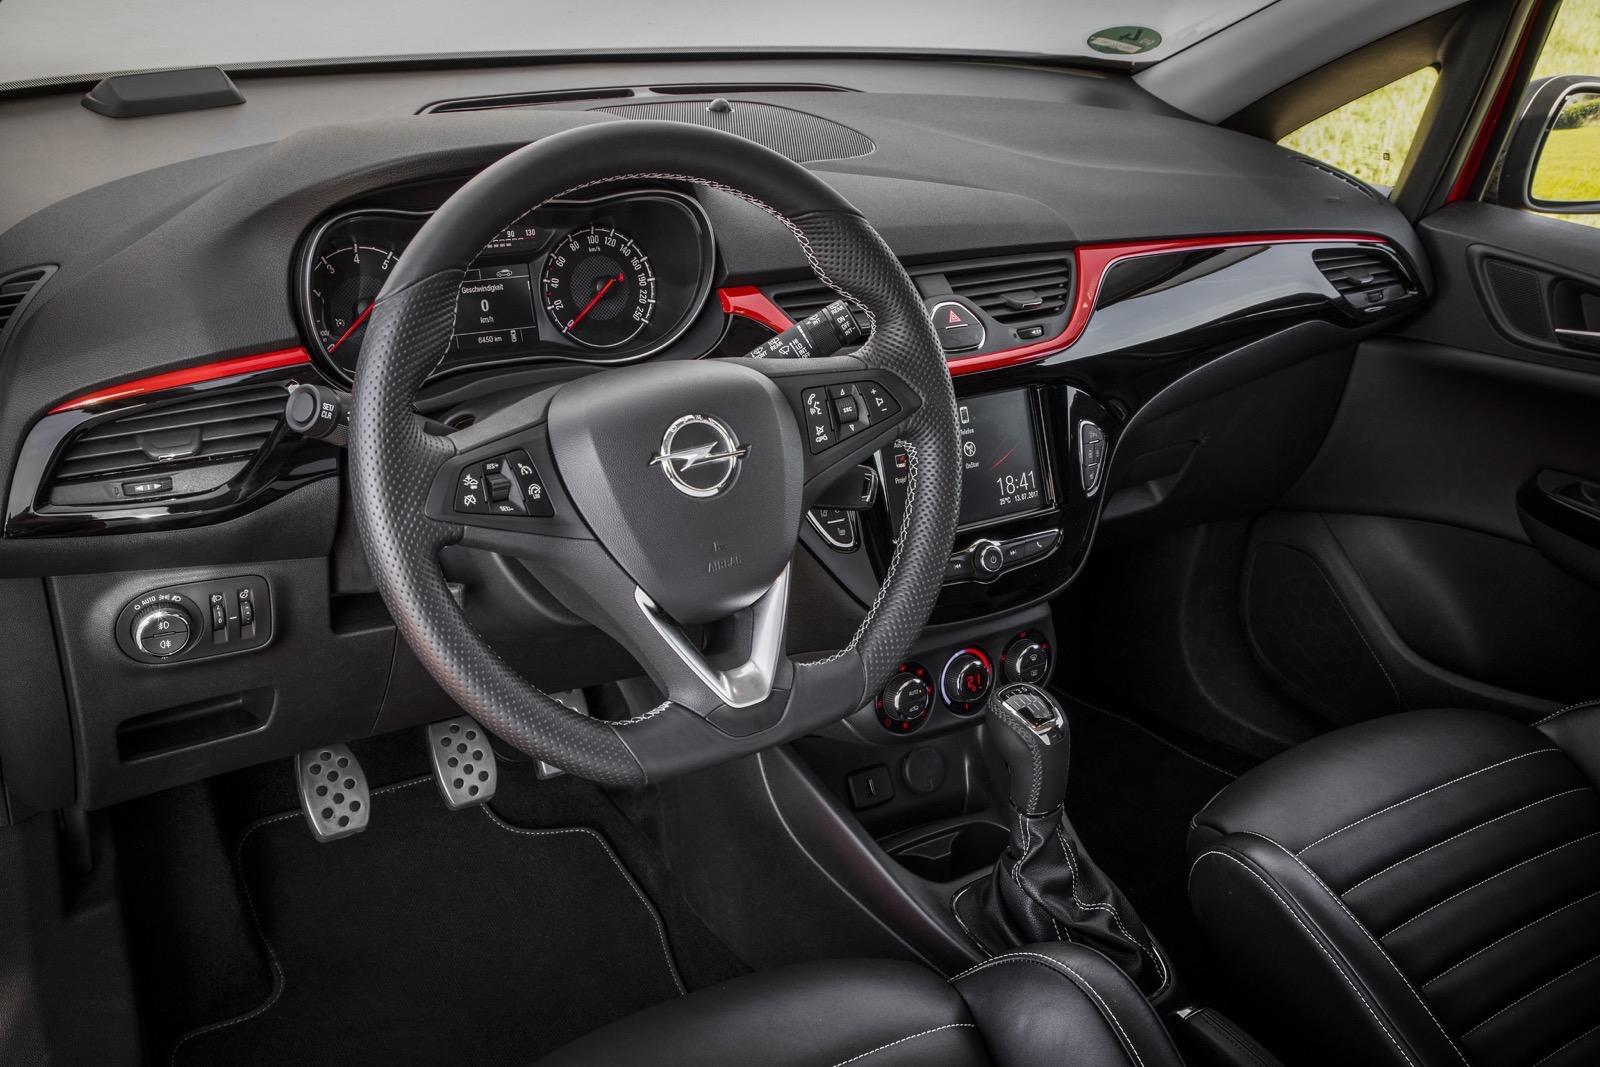 Opel_Corsa_S_05